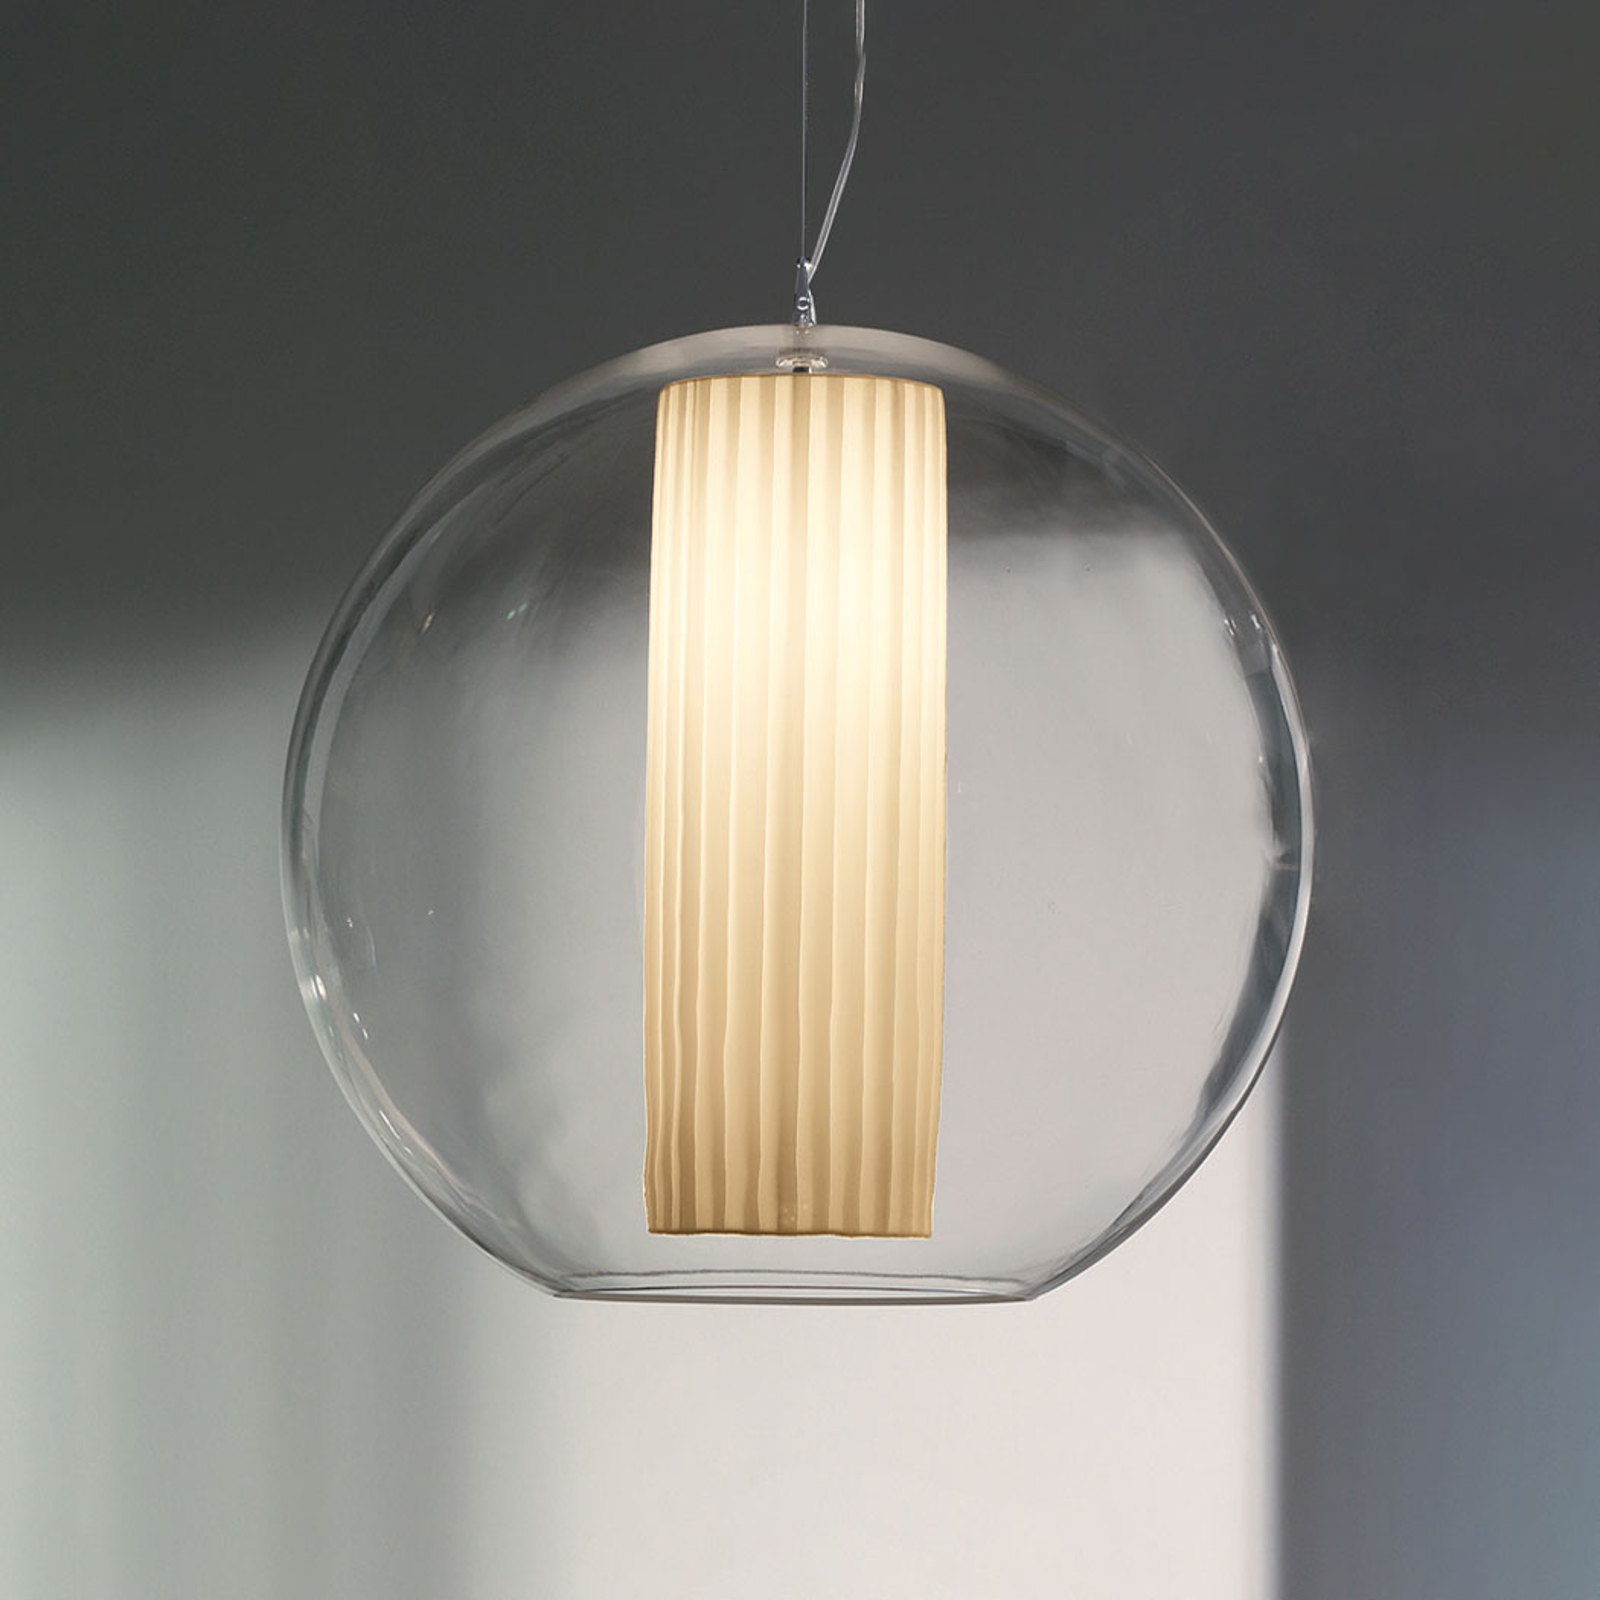 Modo Luce Bolla hanglamp stof wit Ø 40cm